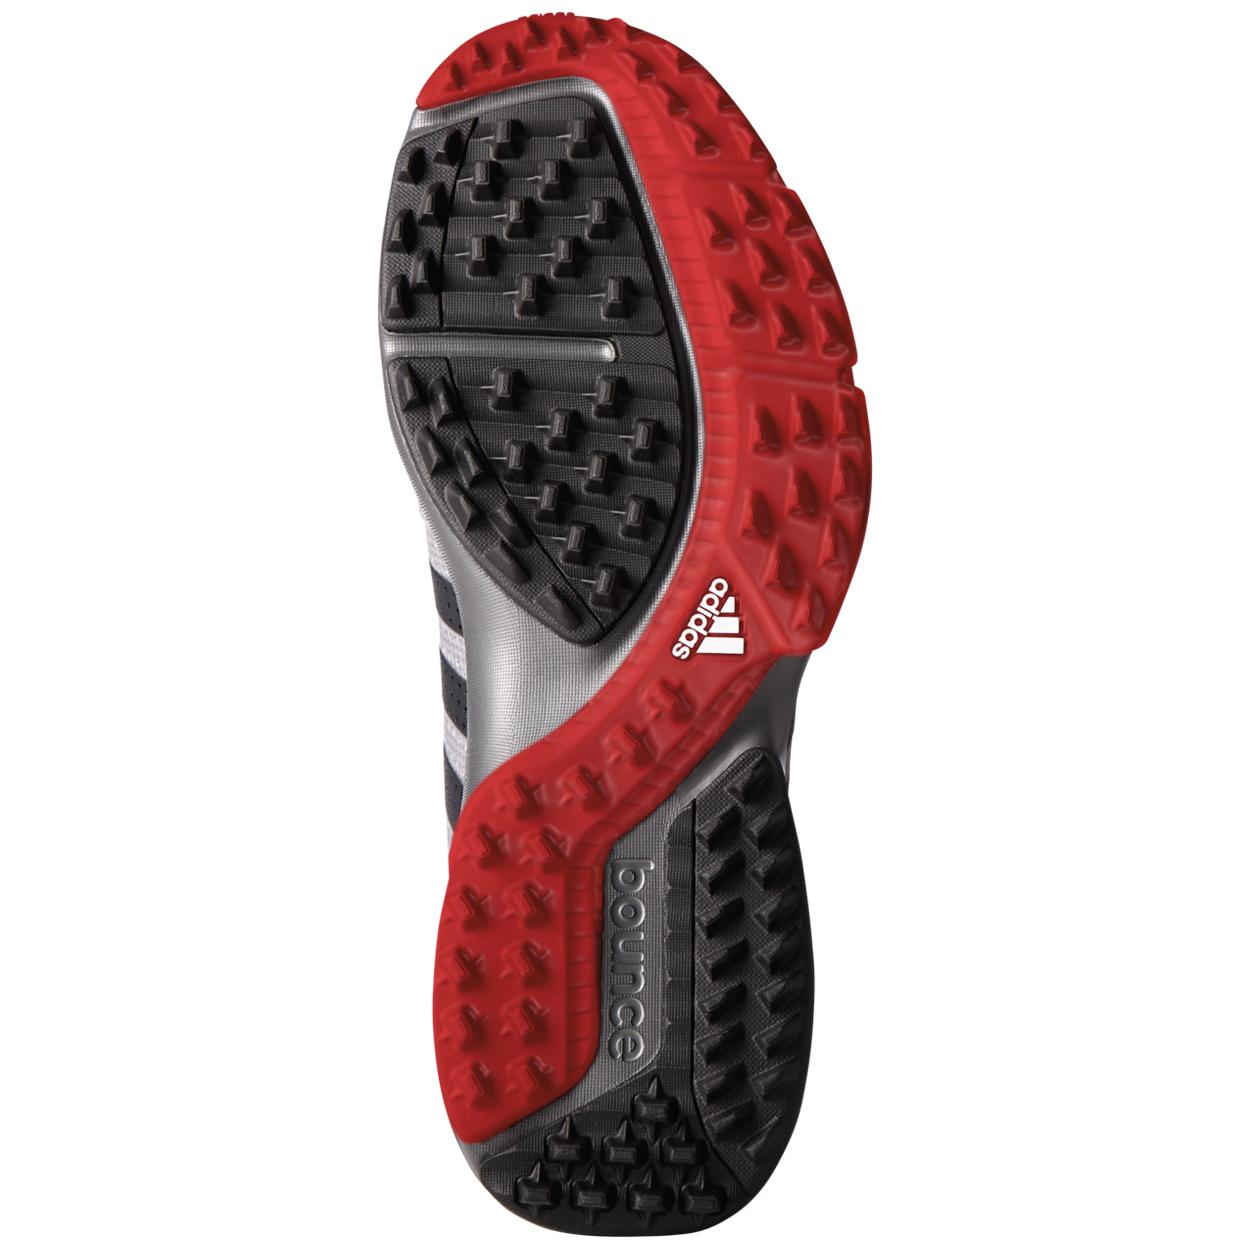 Adidas-Men-039-s-360-Traxion-Golf-Shoes thumbnail 10